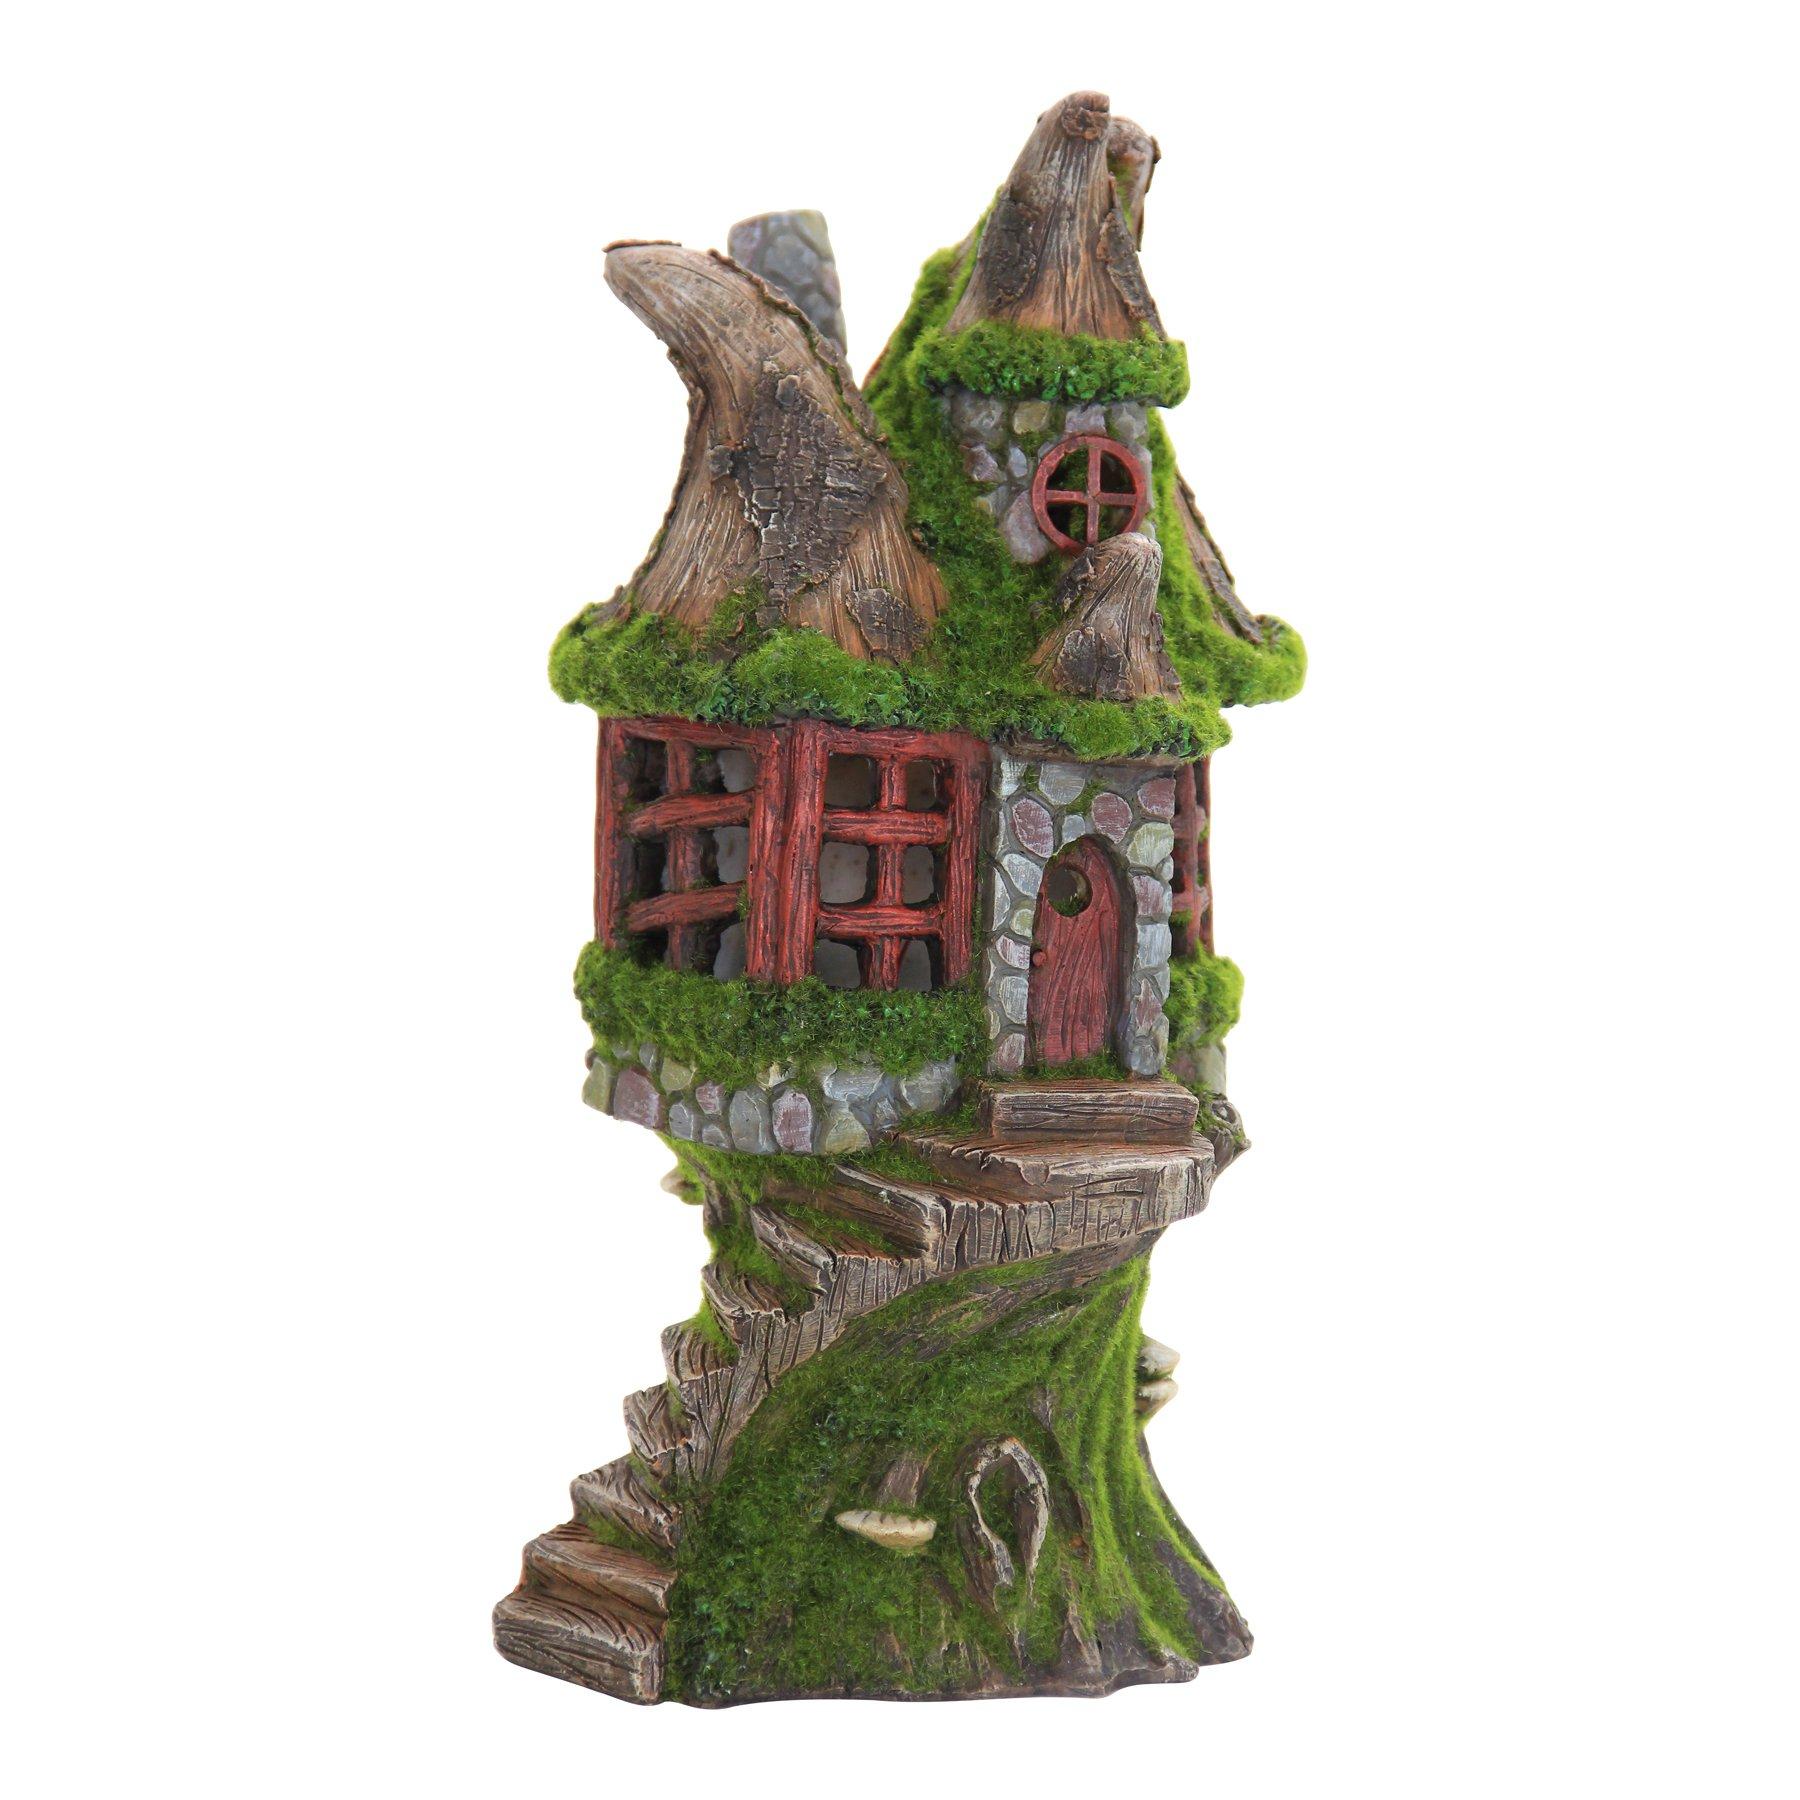 Exhart Woodland Stone Step Fairy Cottage Garden Statue, Fairy Gardening, Resin, Solar Powered, 7'' L x 7'' W x 12'' H